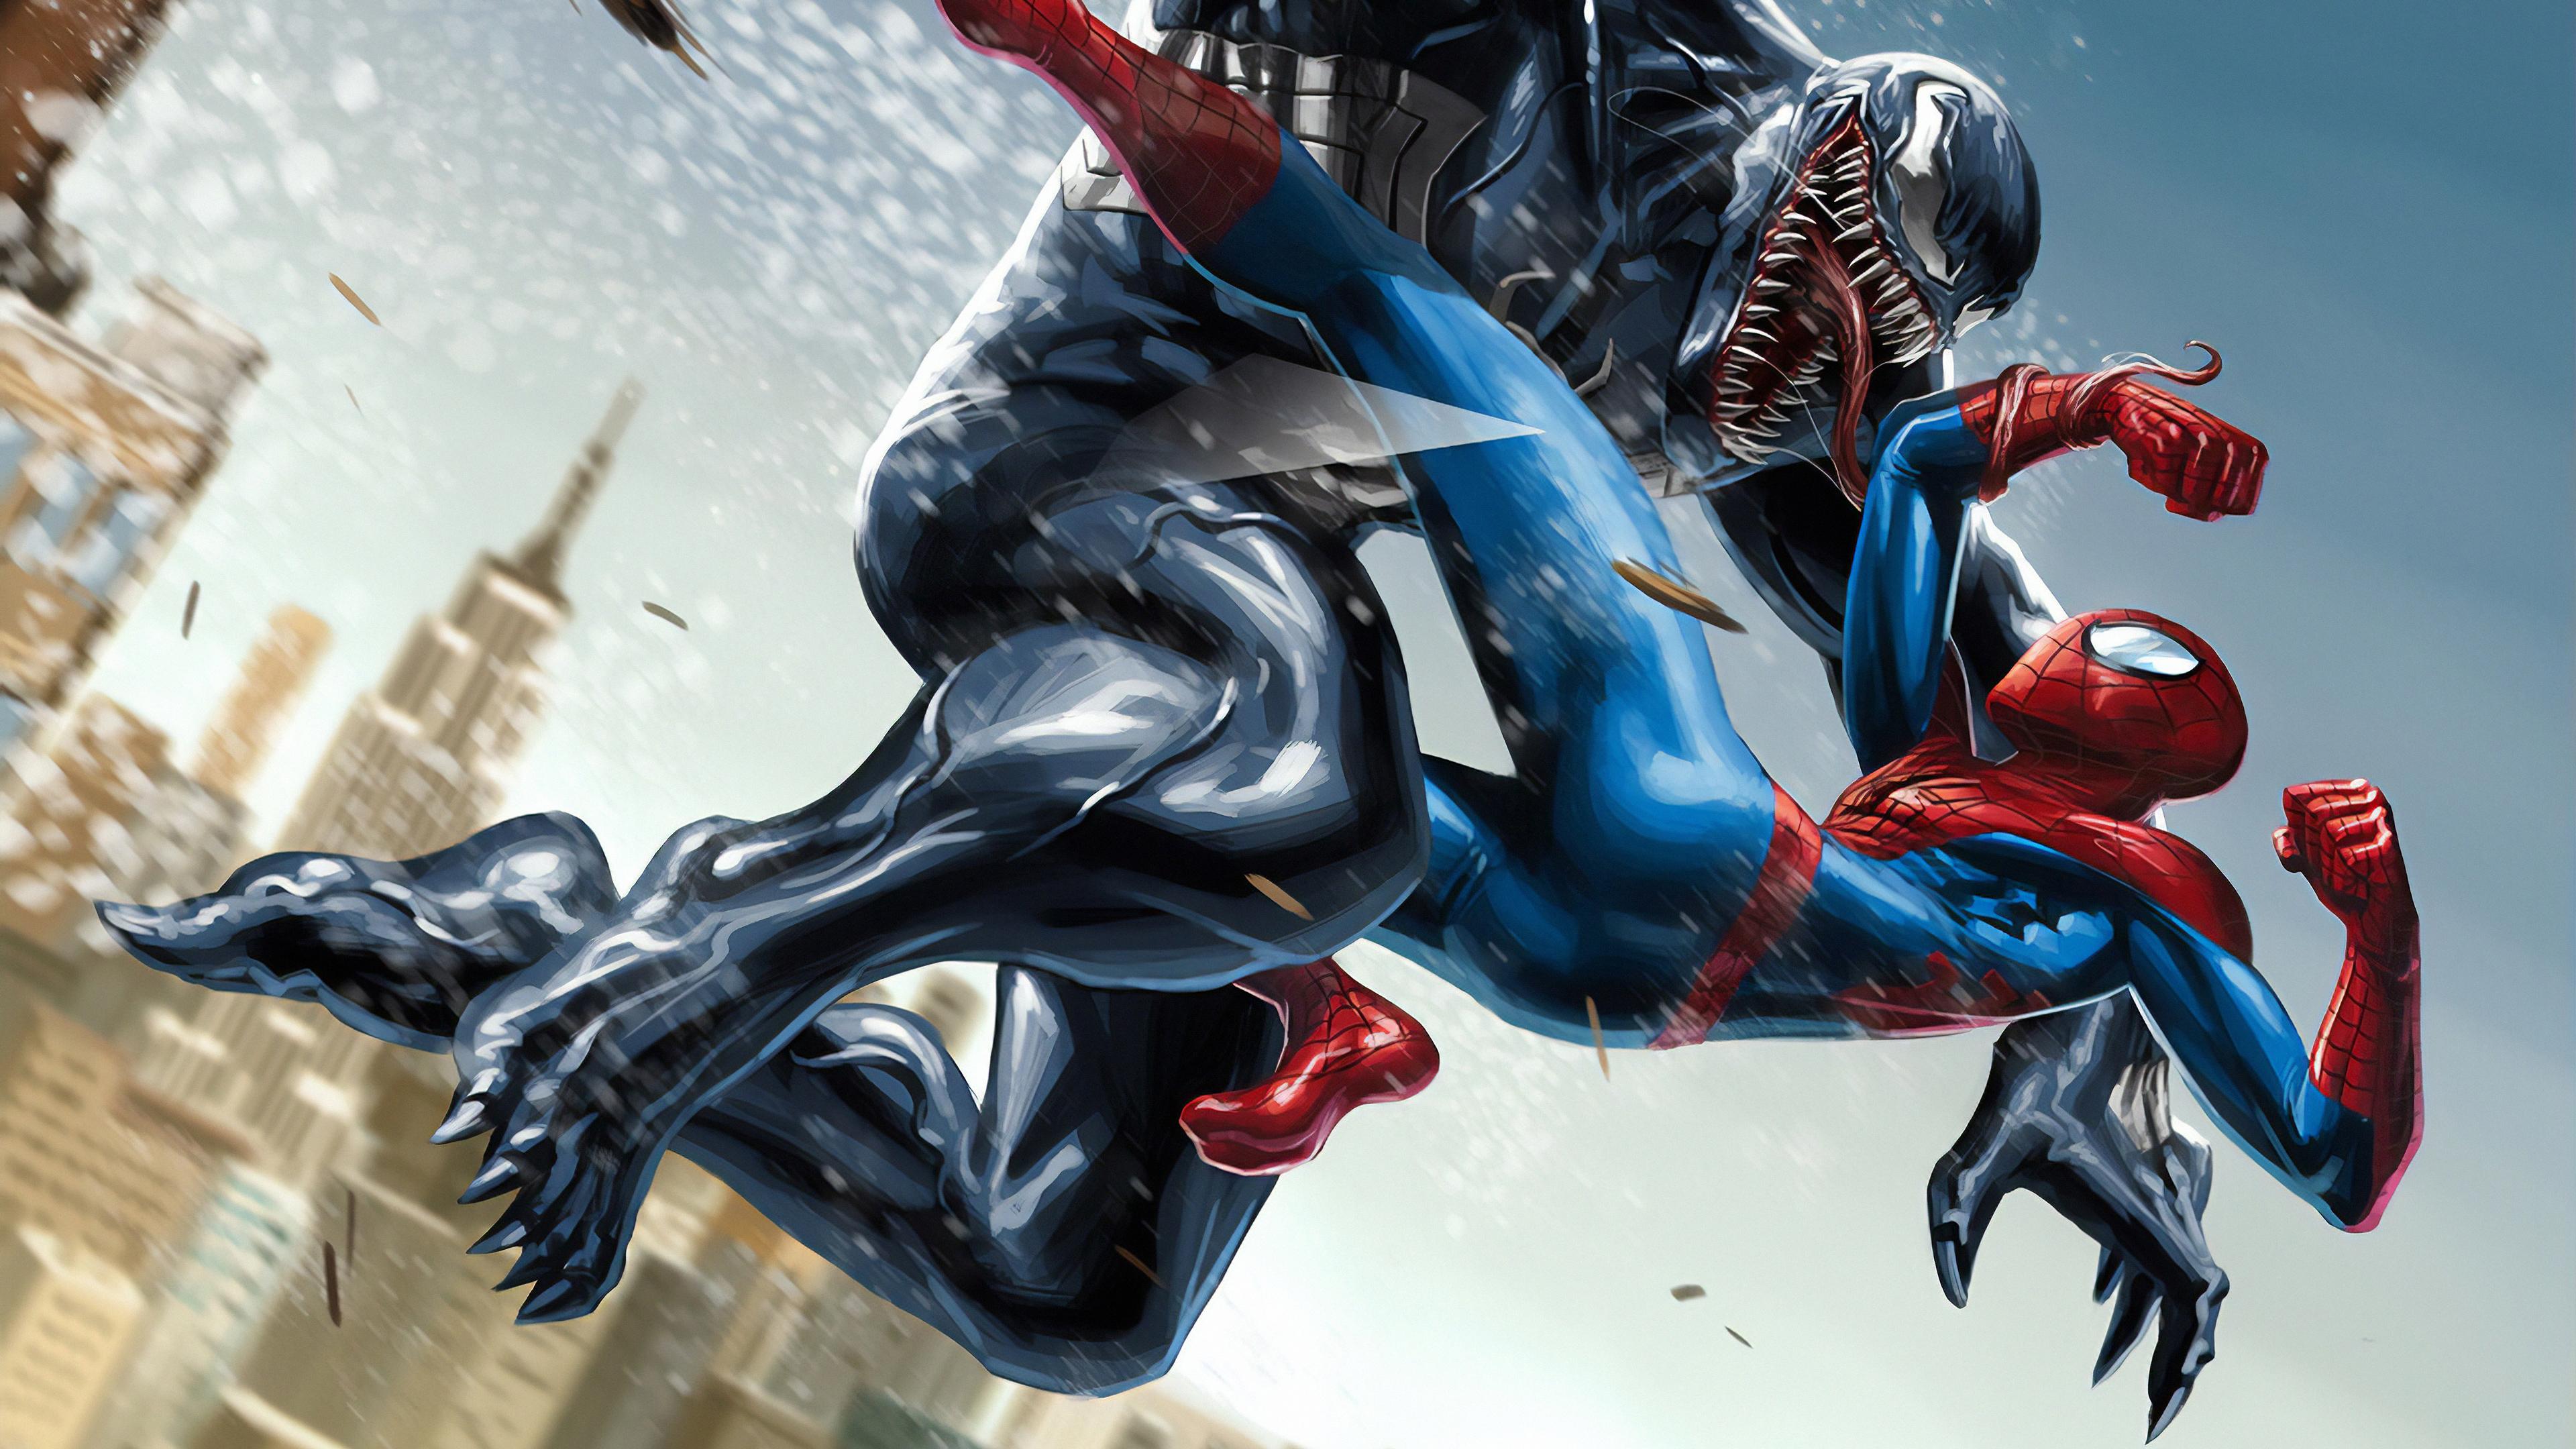 venom spiderman 1562105898 - Venom Spiderman - Venom wallpapers, superheroes wallpapers, spiderman wallpapers, hd-wallpapers, artwork wallpapers, 4k-wallpapers